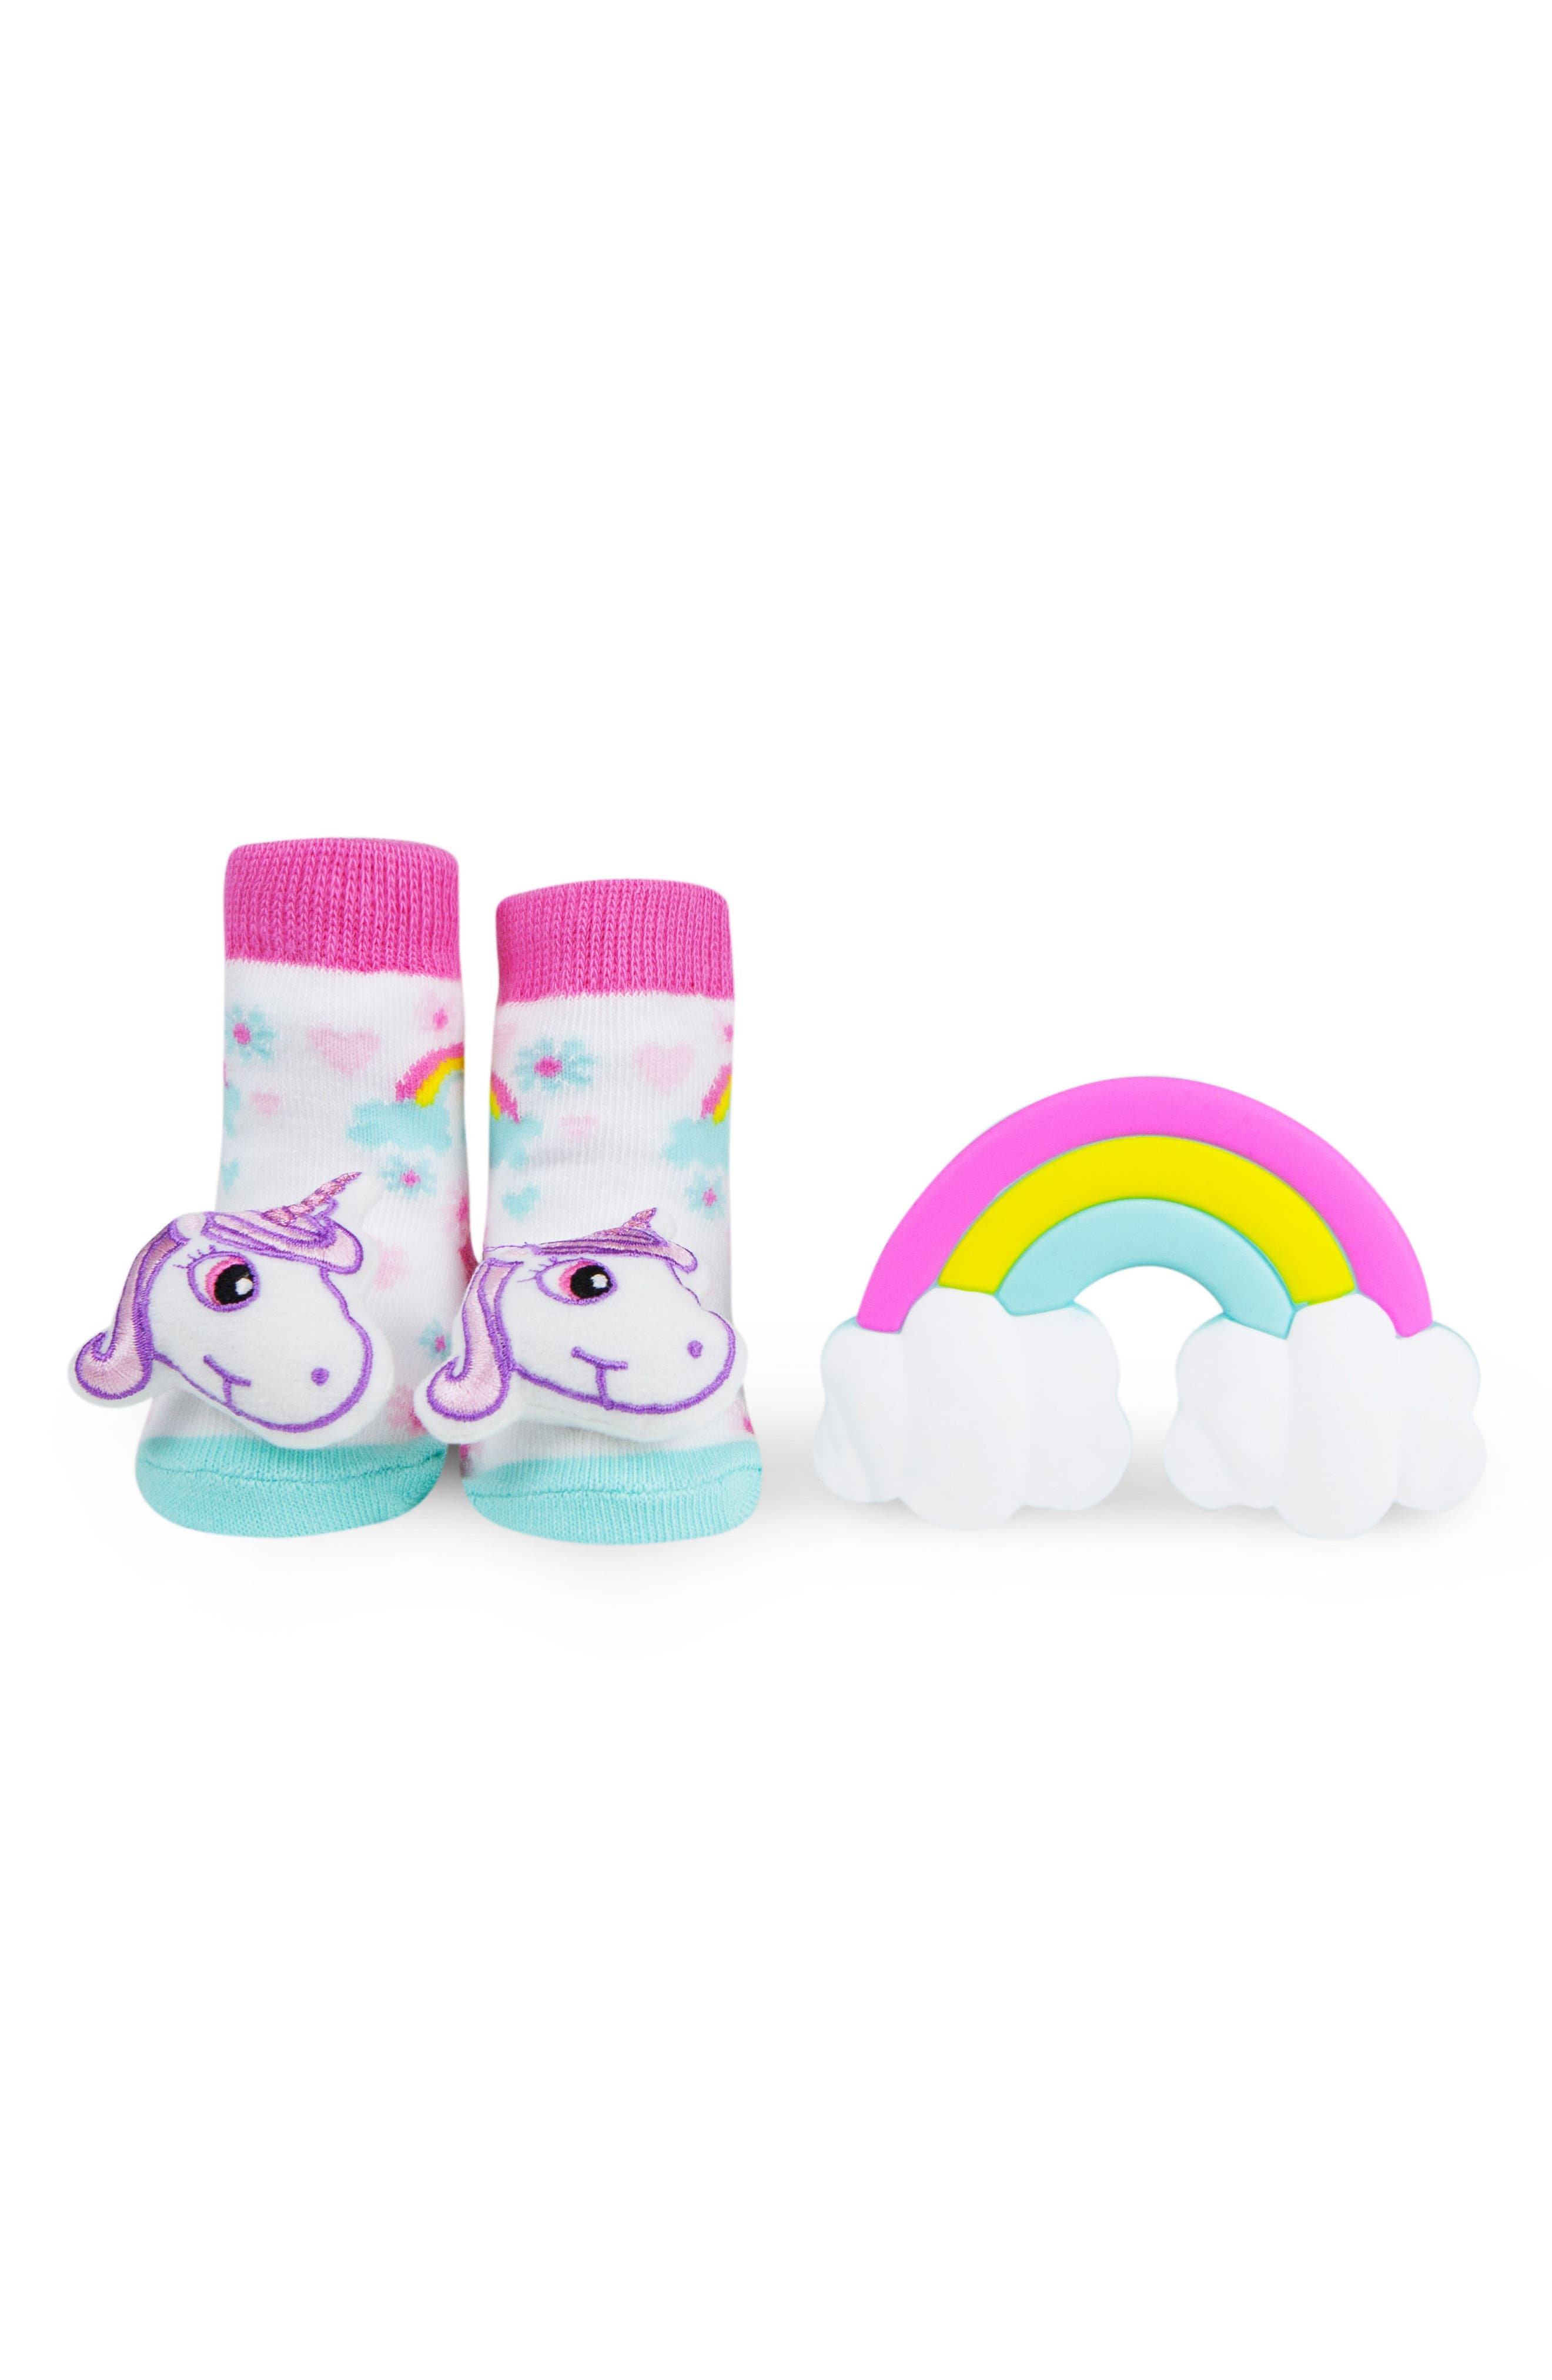 & Friends Unicorn Rattle Socks & Teether Gift Set,                         Main,                         color, White